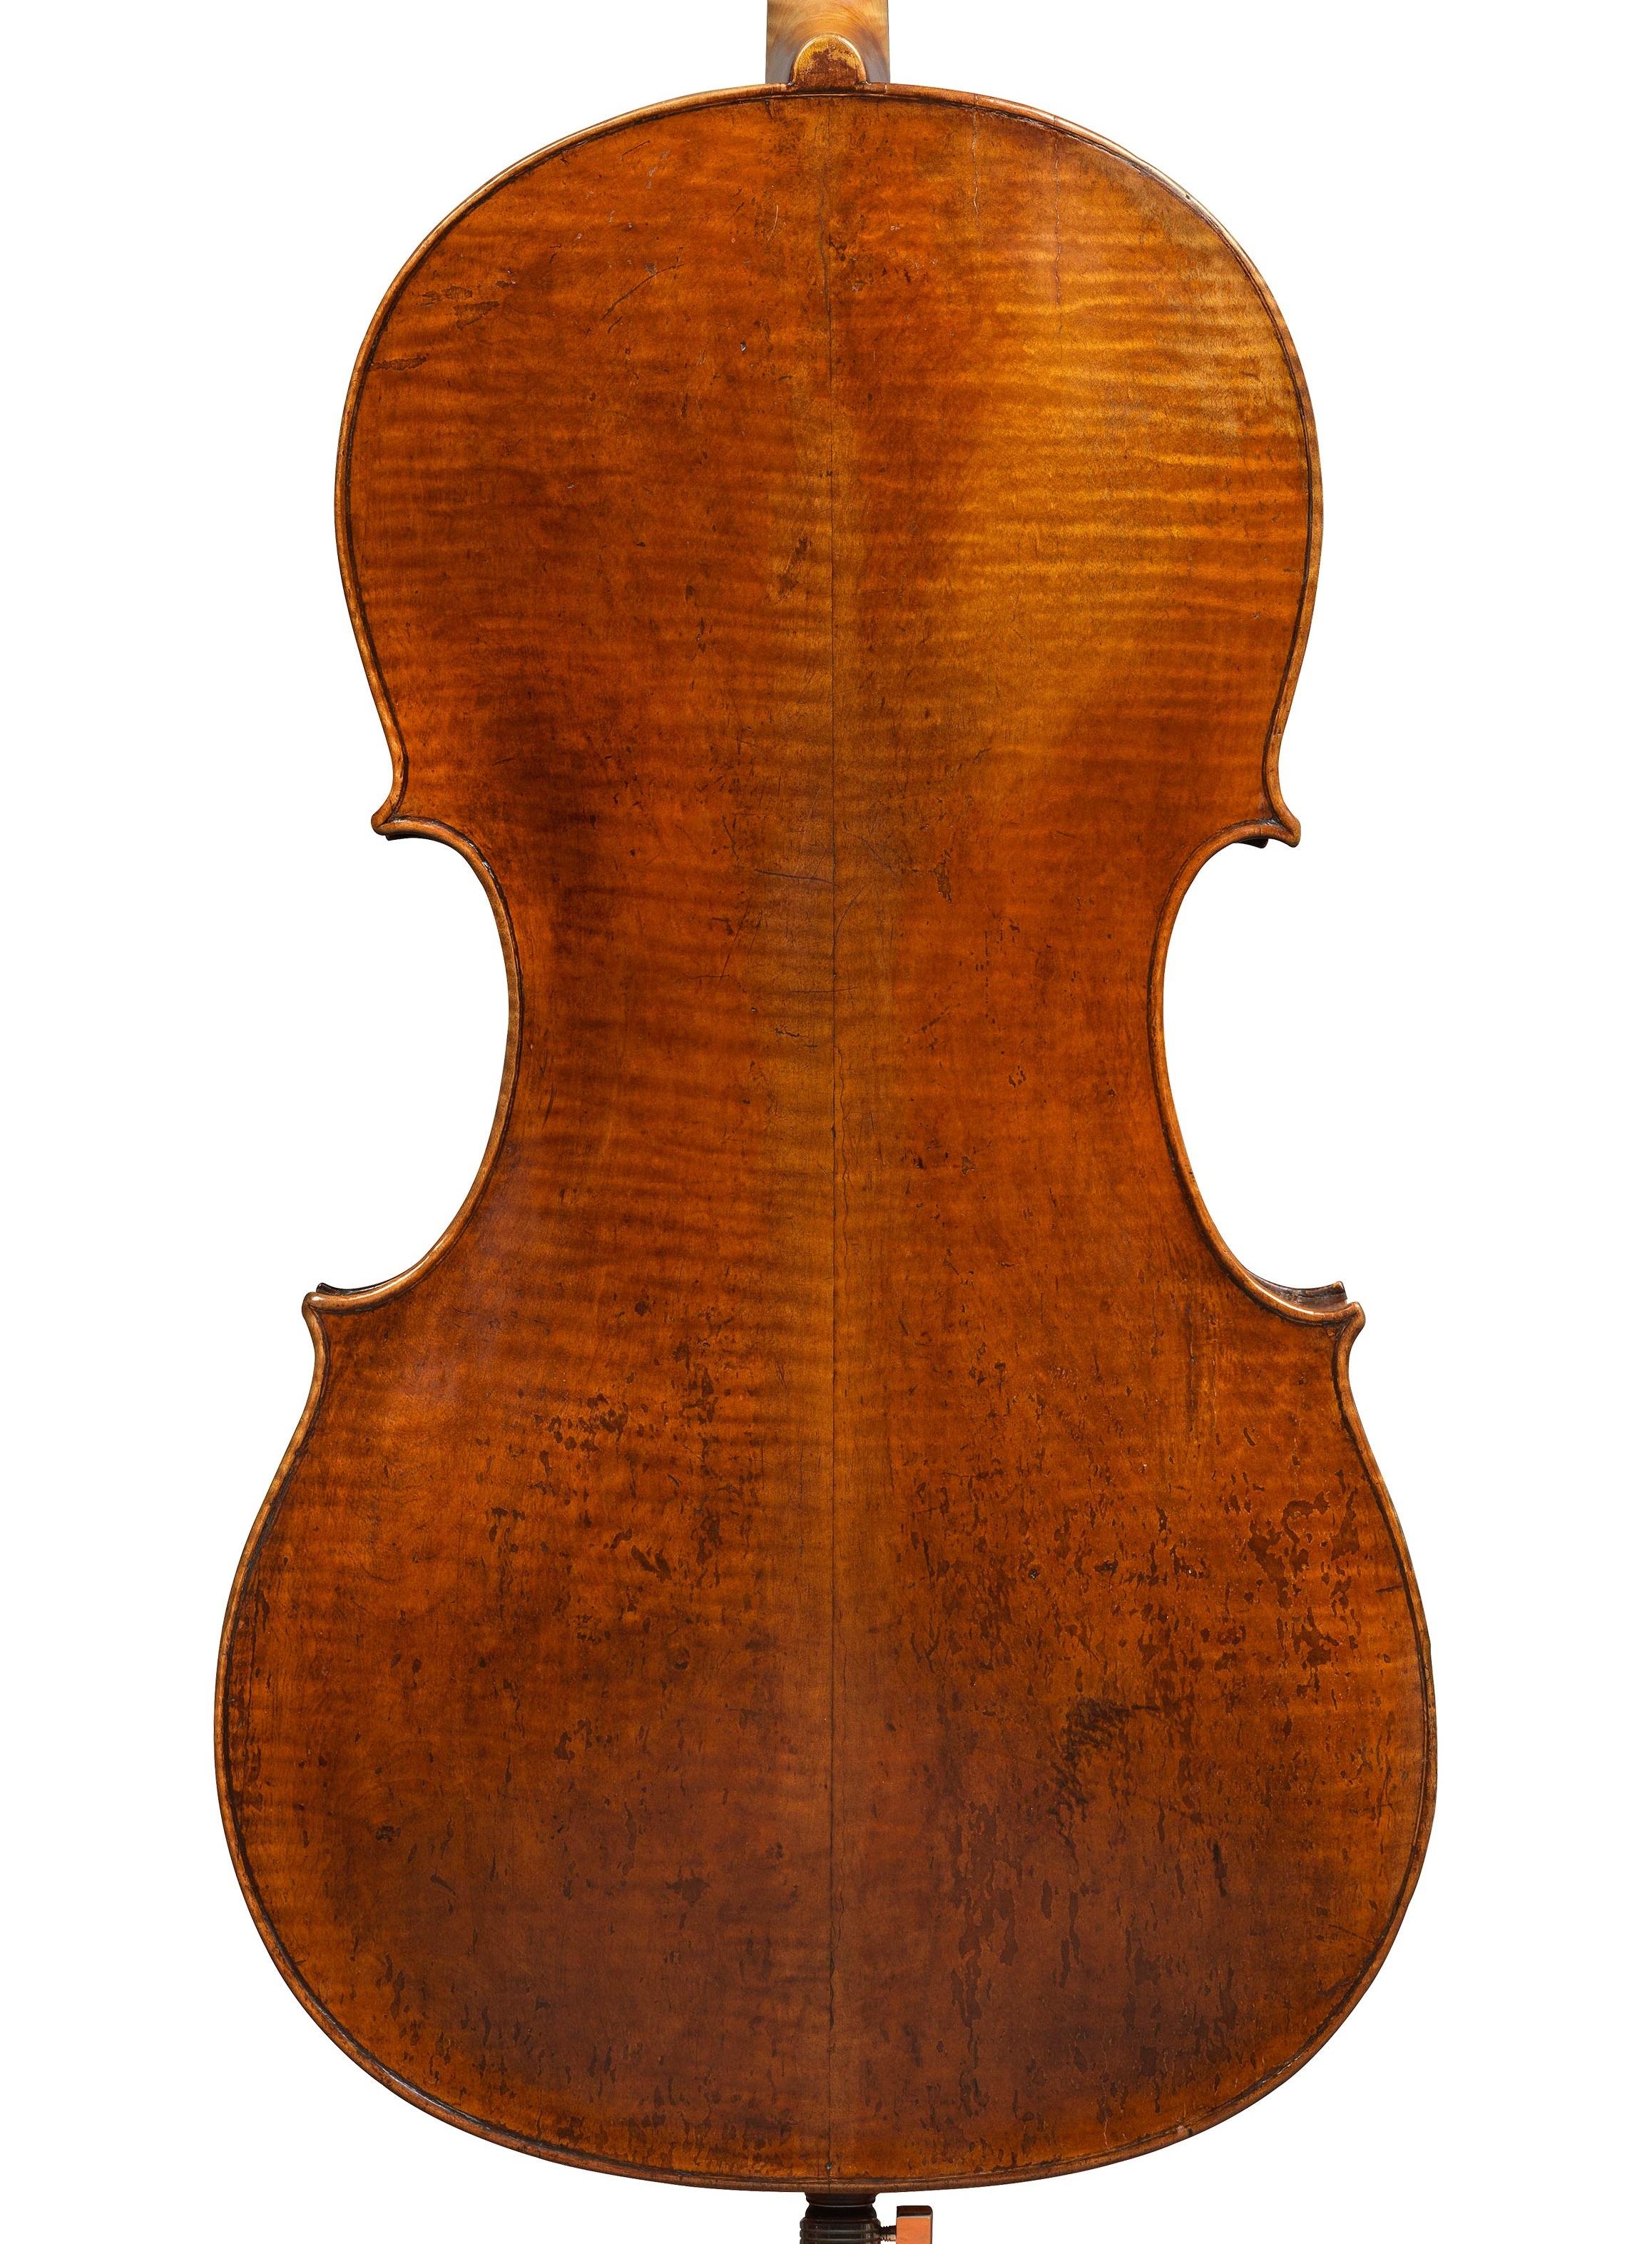 Back of a cello by Giuseppe filius Andreae, Cremona, 1713